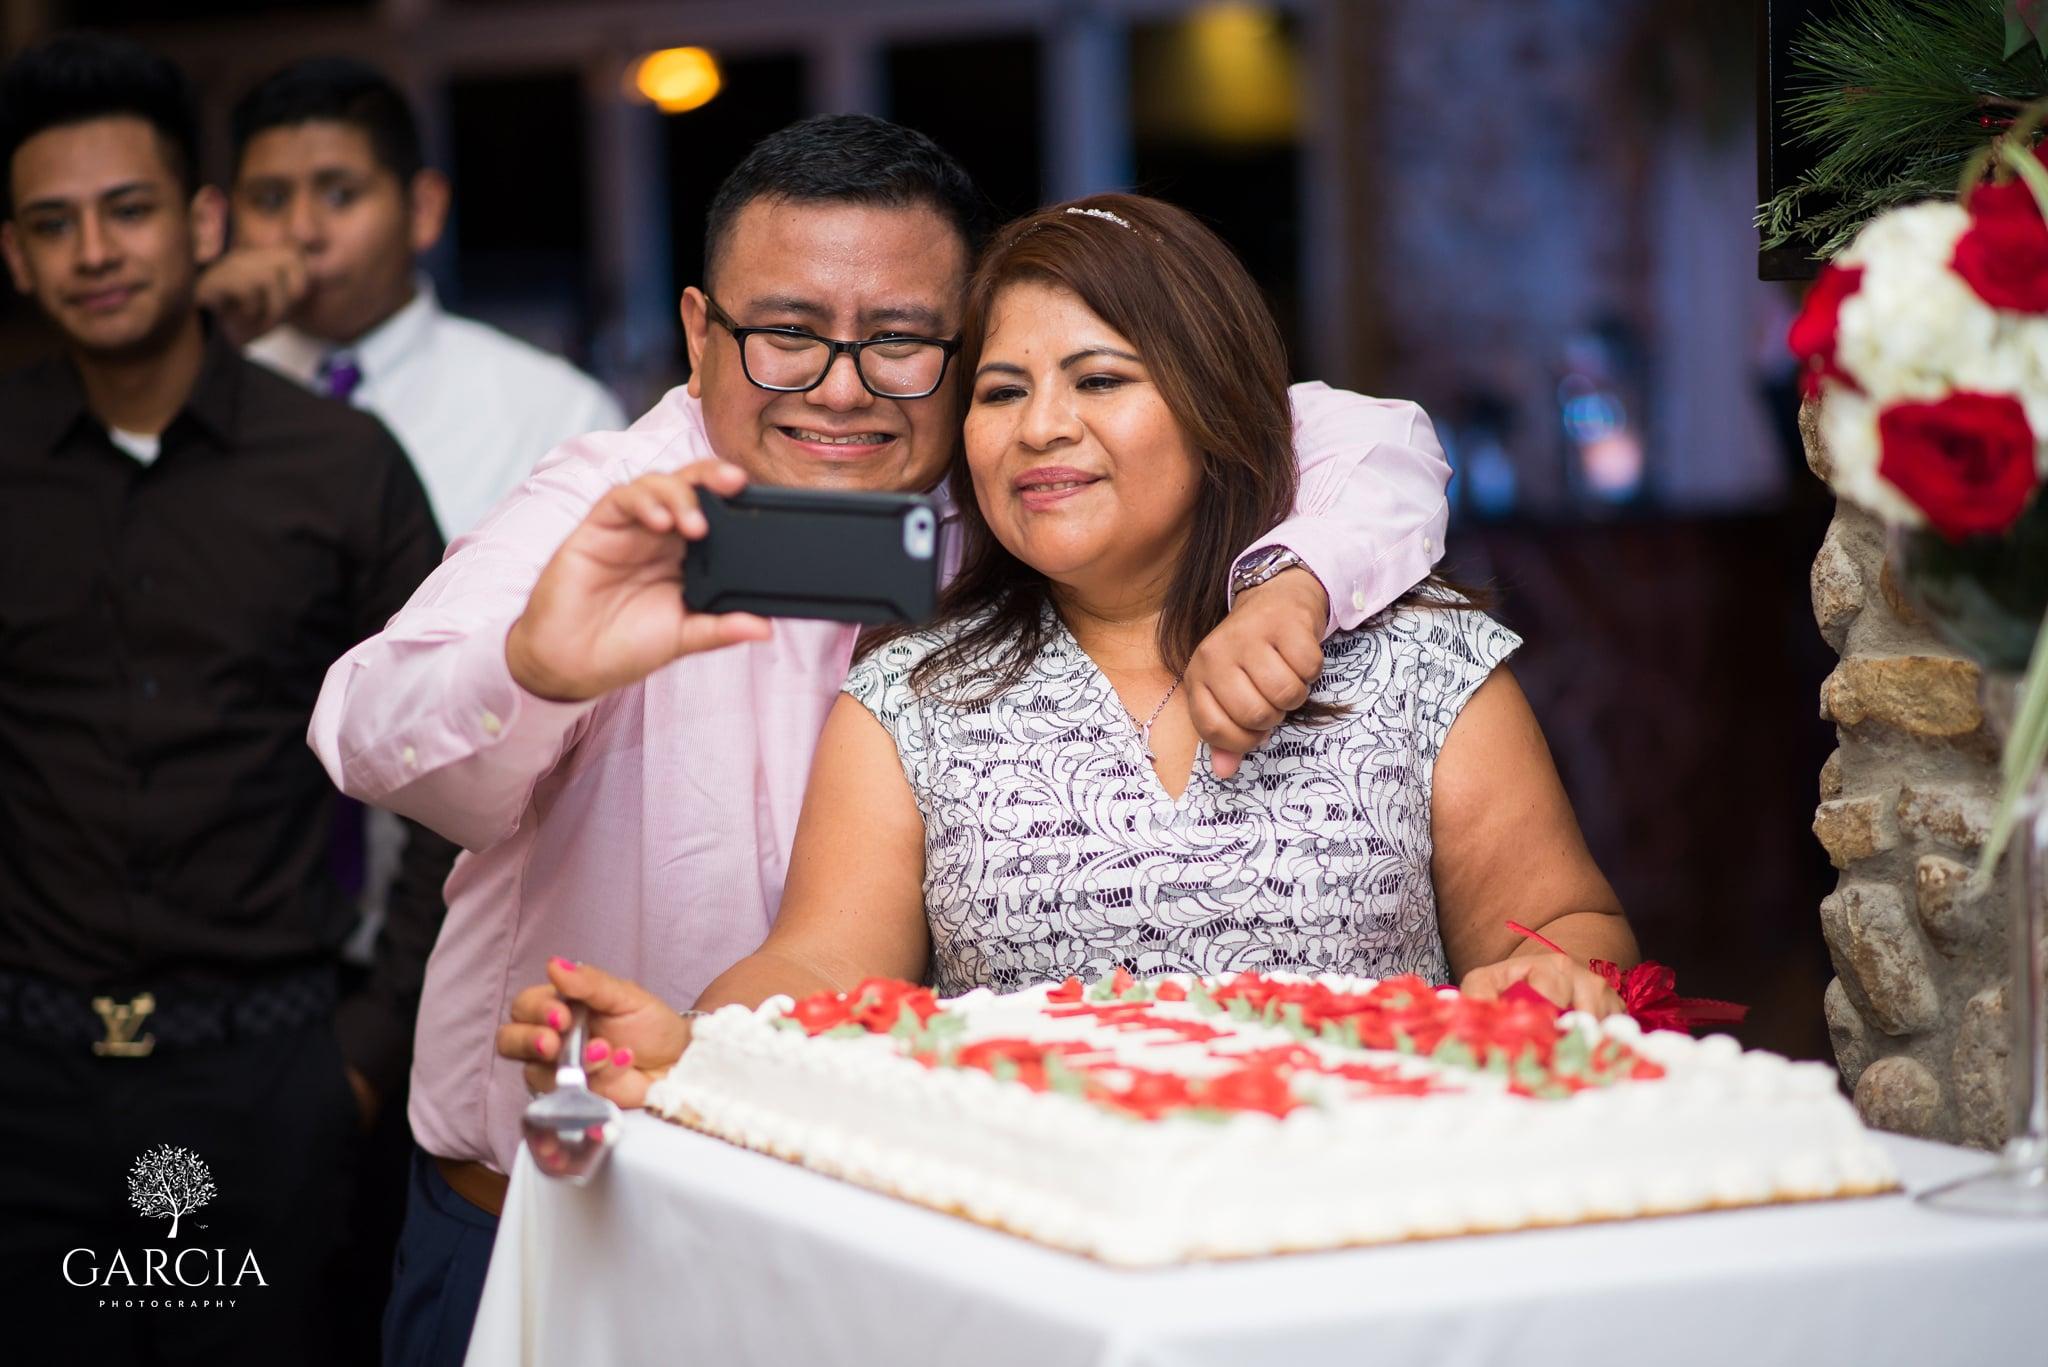 Neli-Birthday-Garcia-Event-Photography_2108.jpg